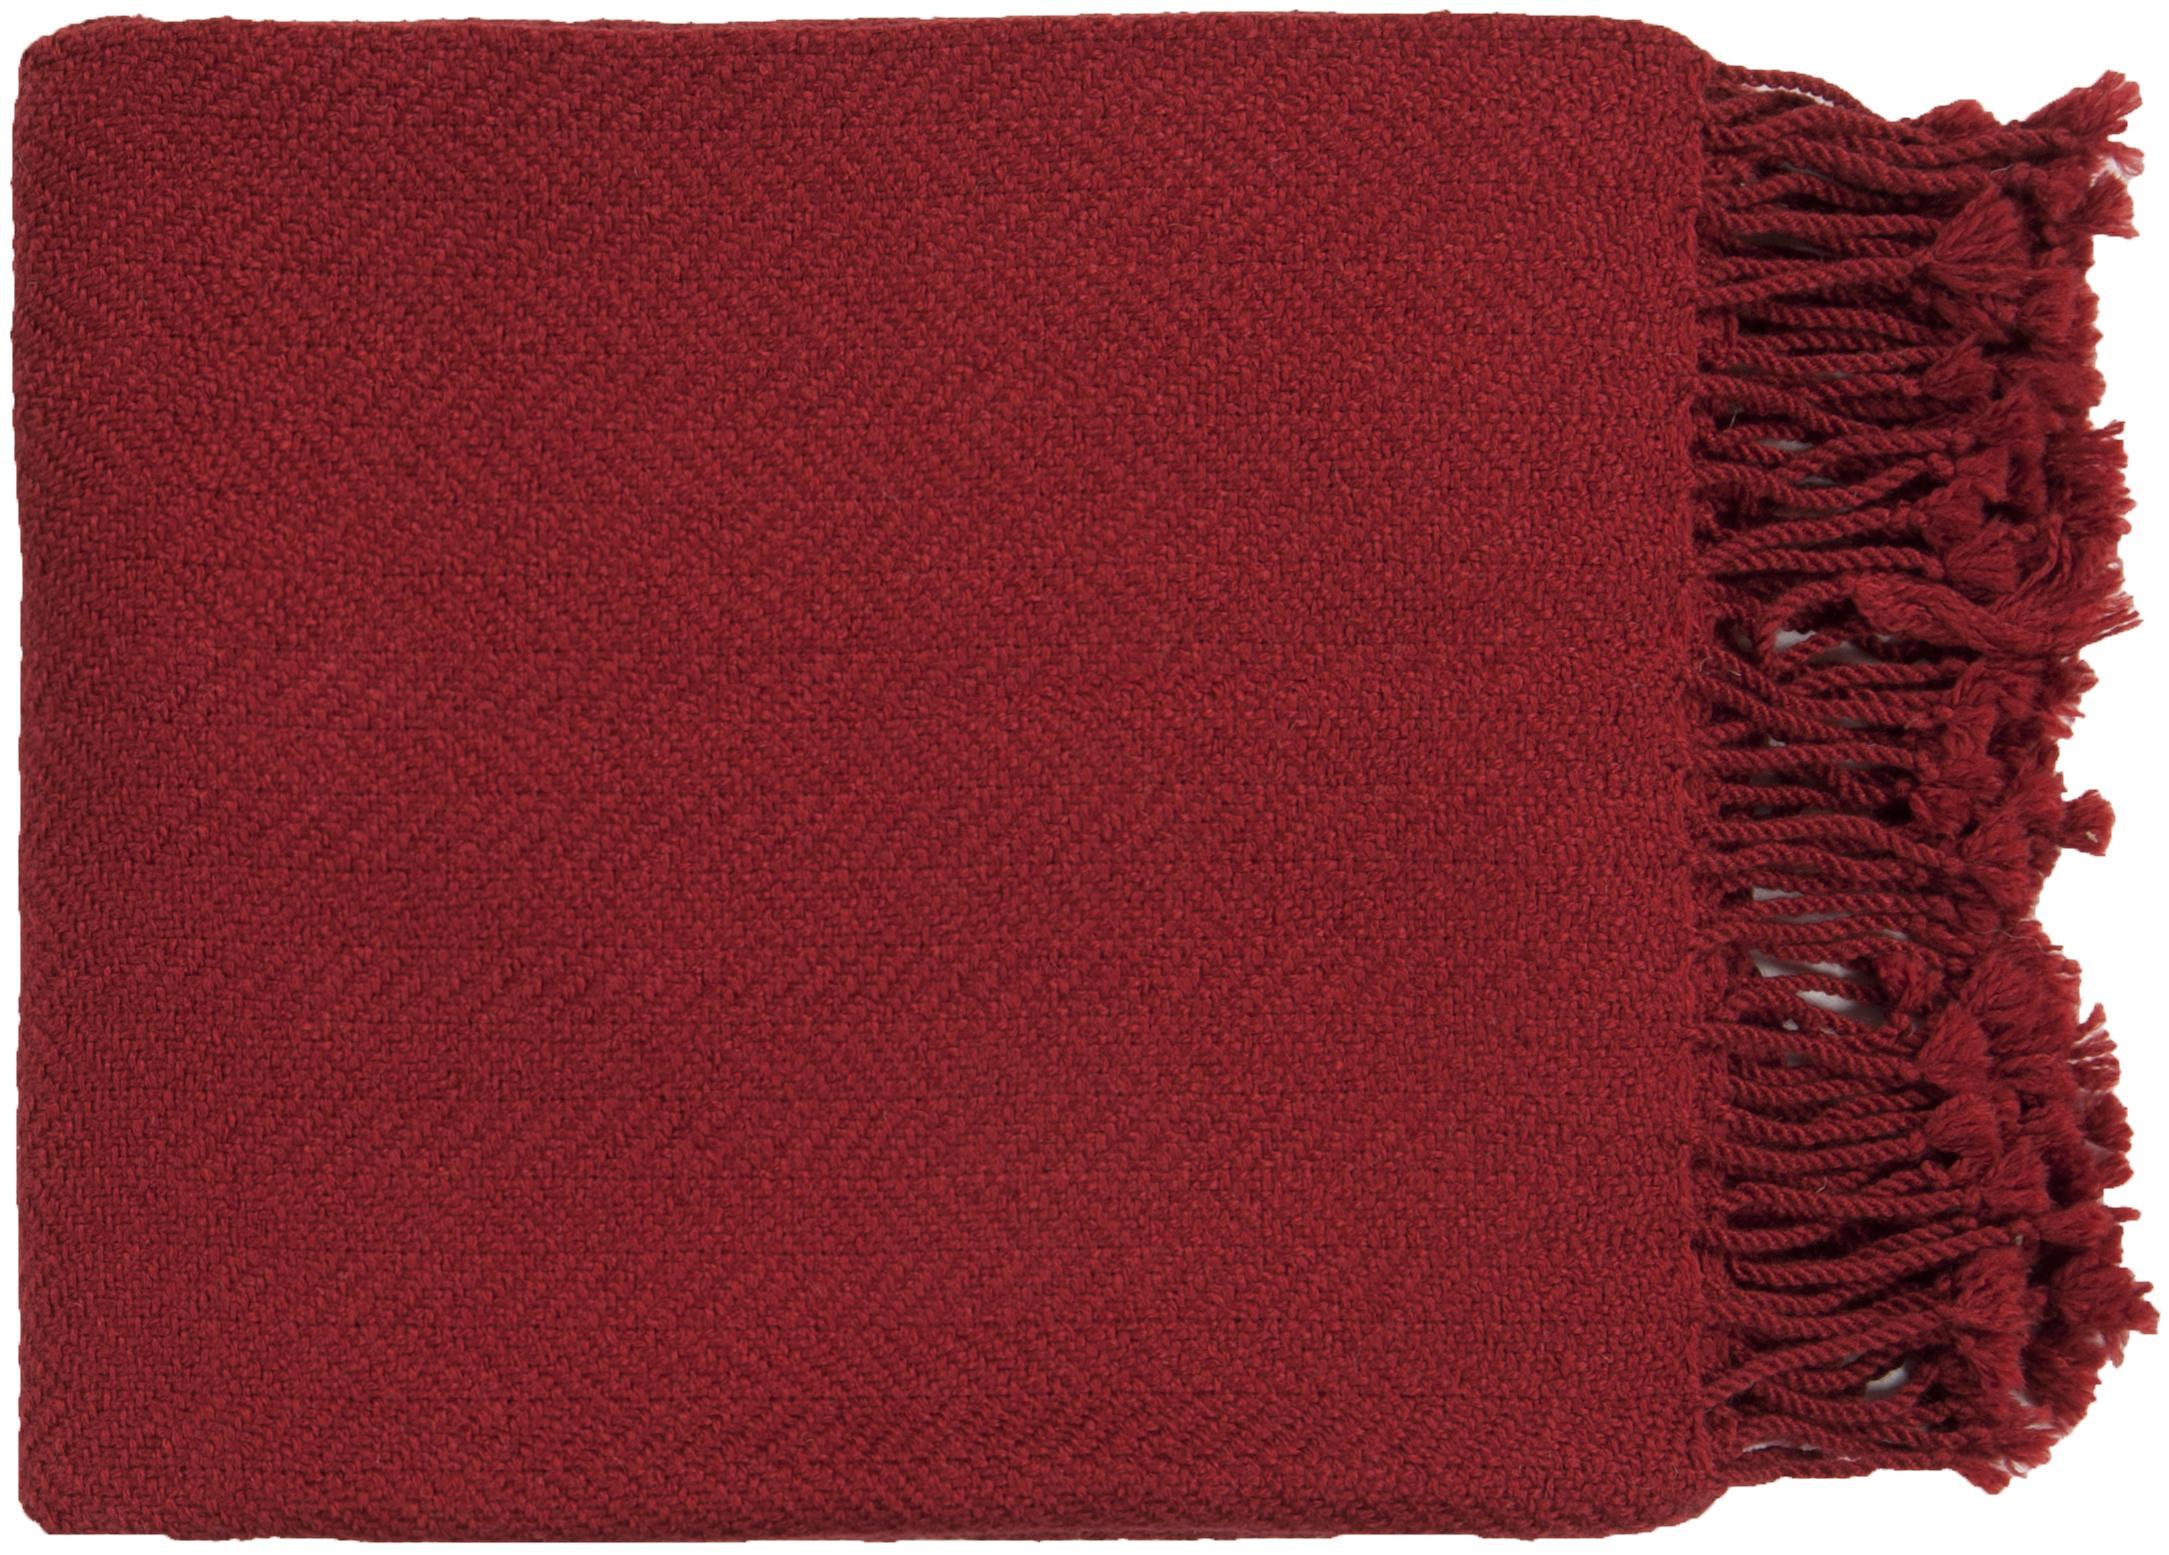 "Surya Throw Blankets Turner 50"" x 60"" Throw - Item Number: TUR8405-5060"